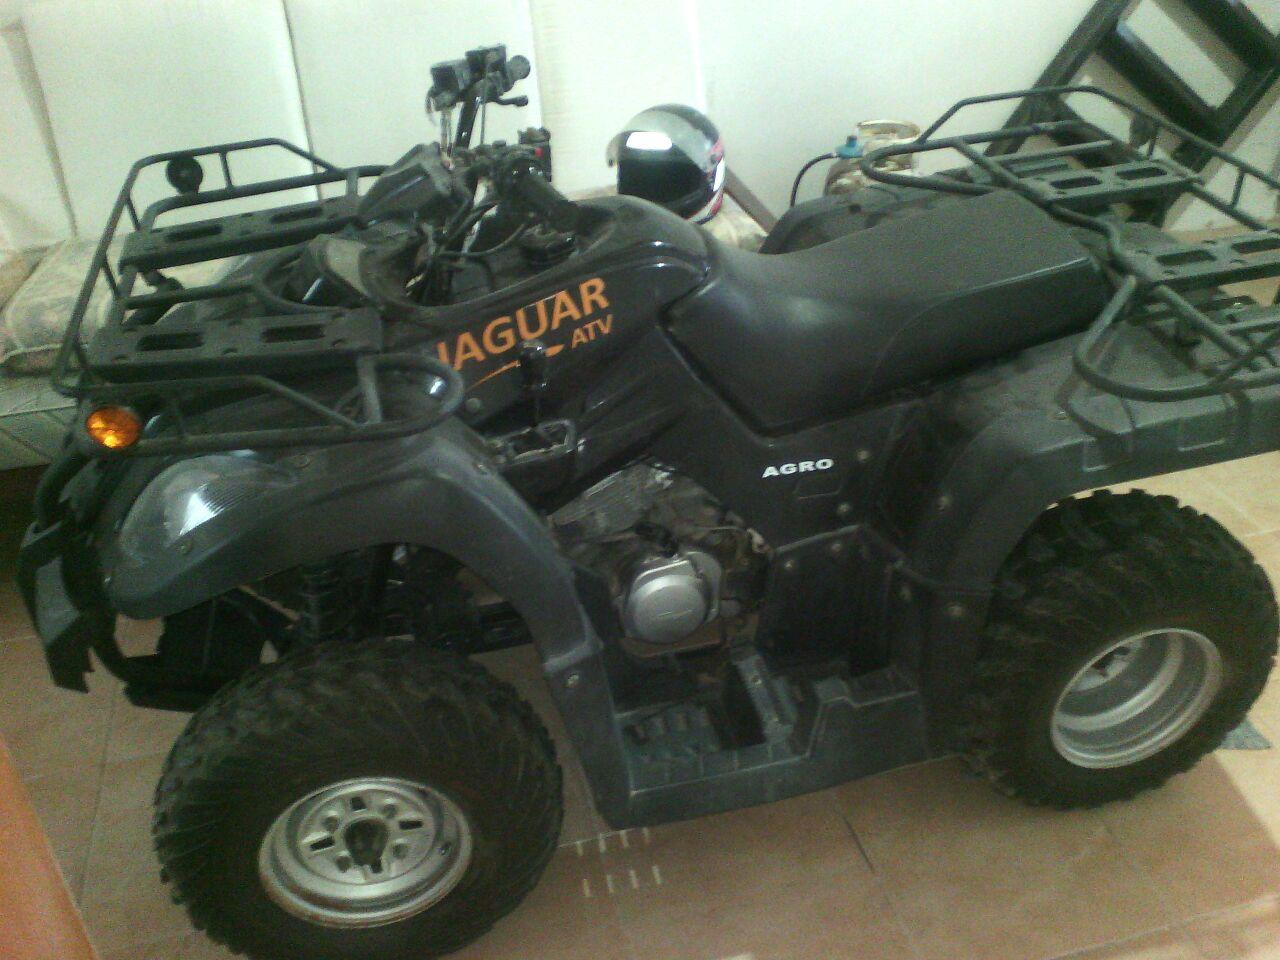 JAGUAR 250 AGRO